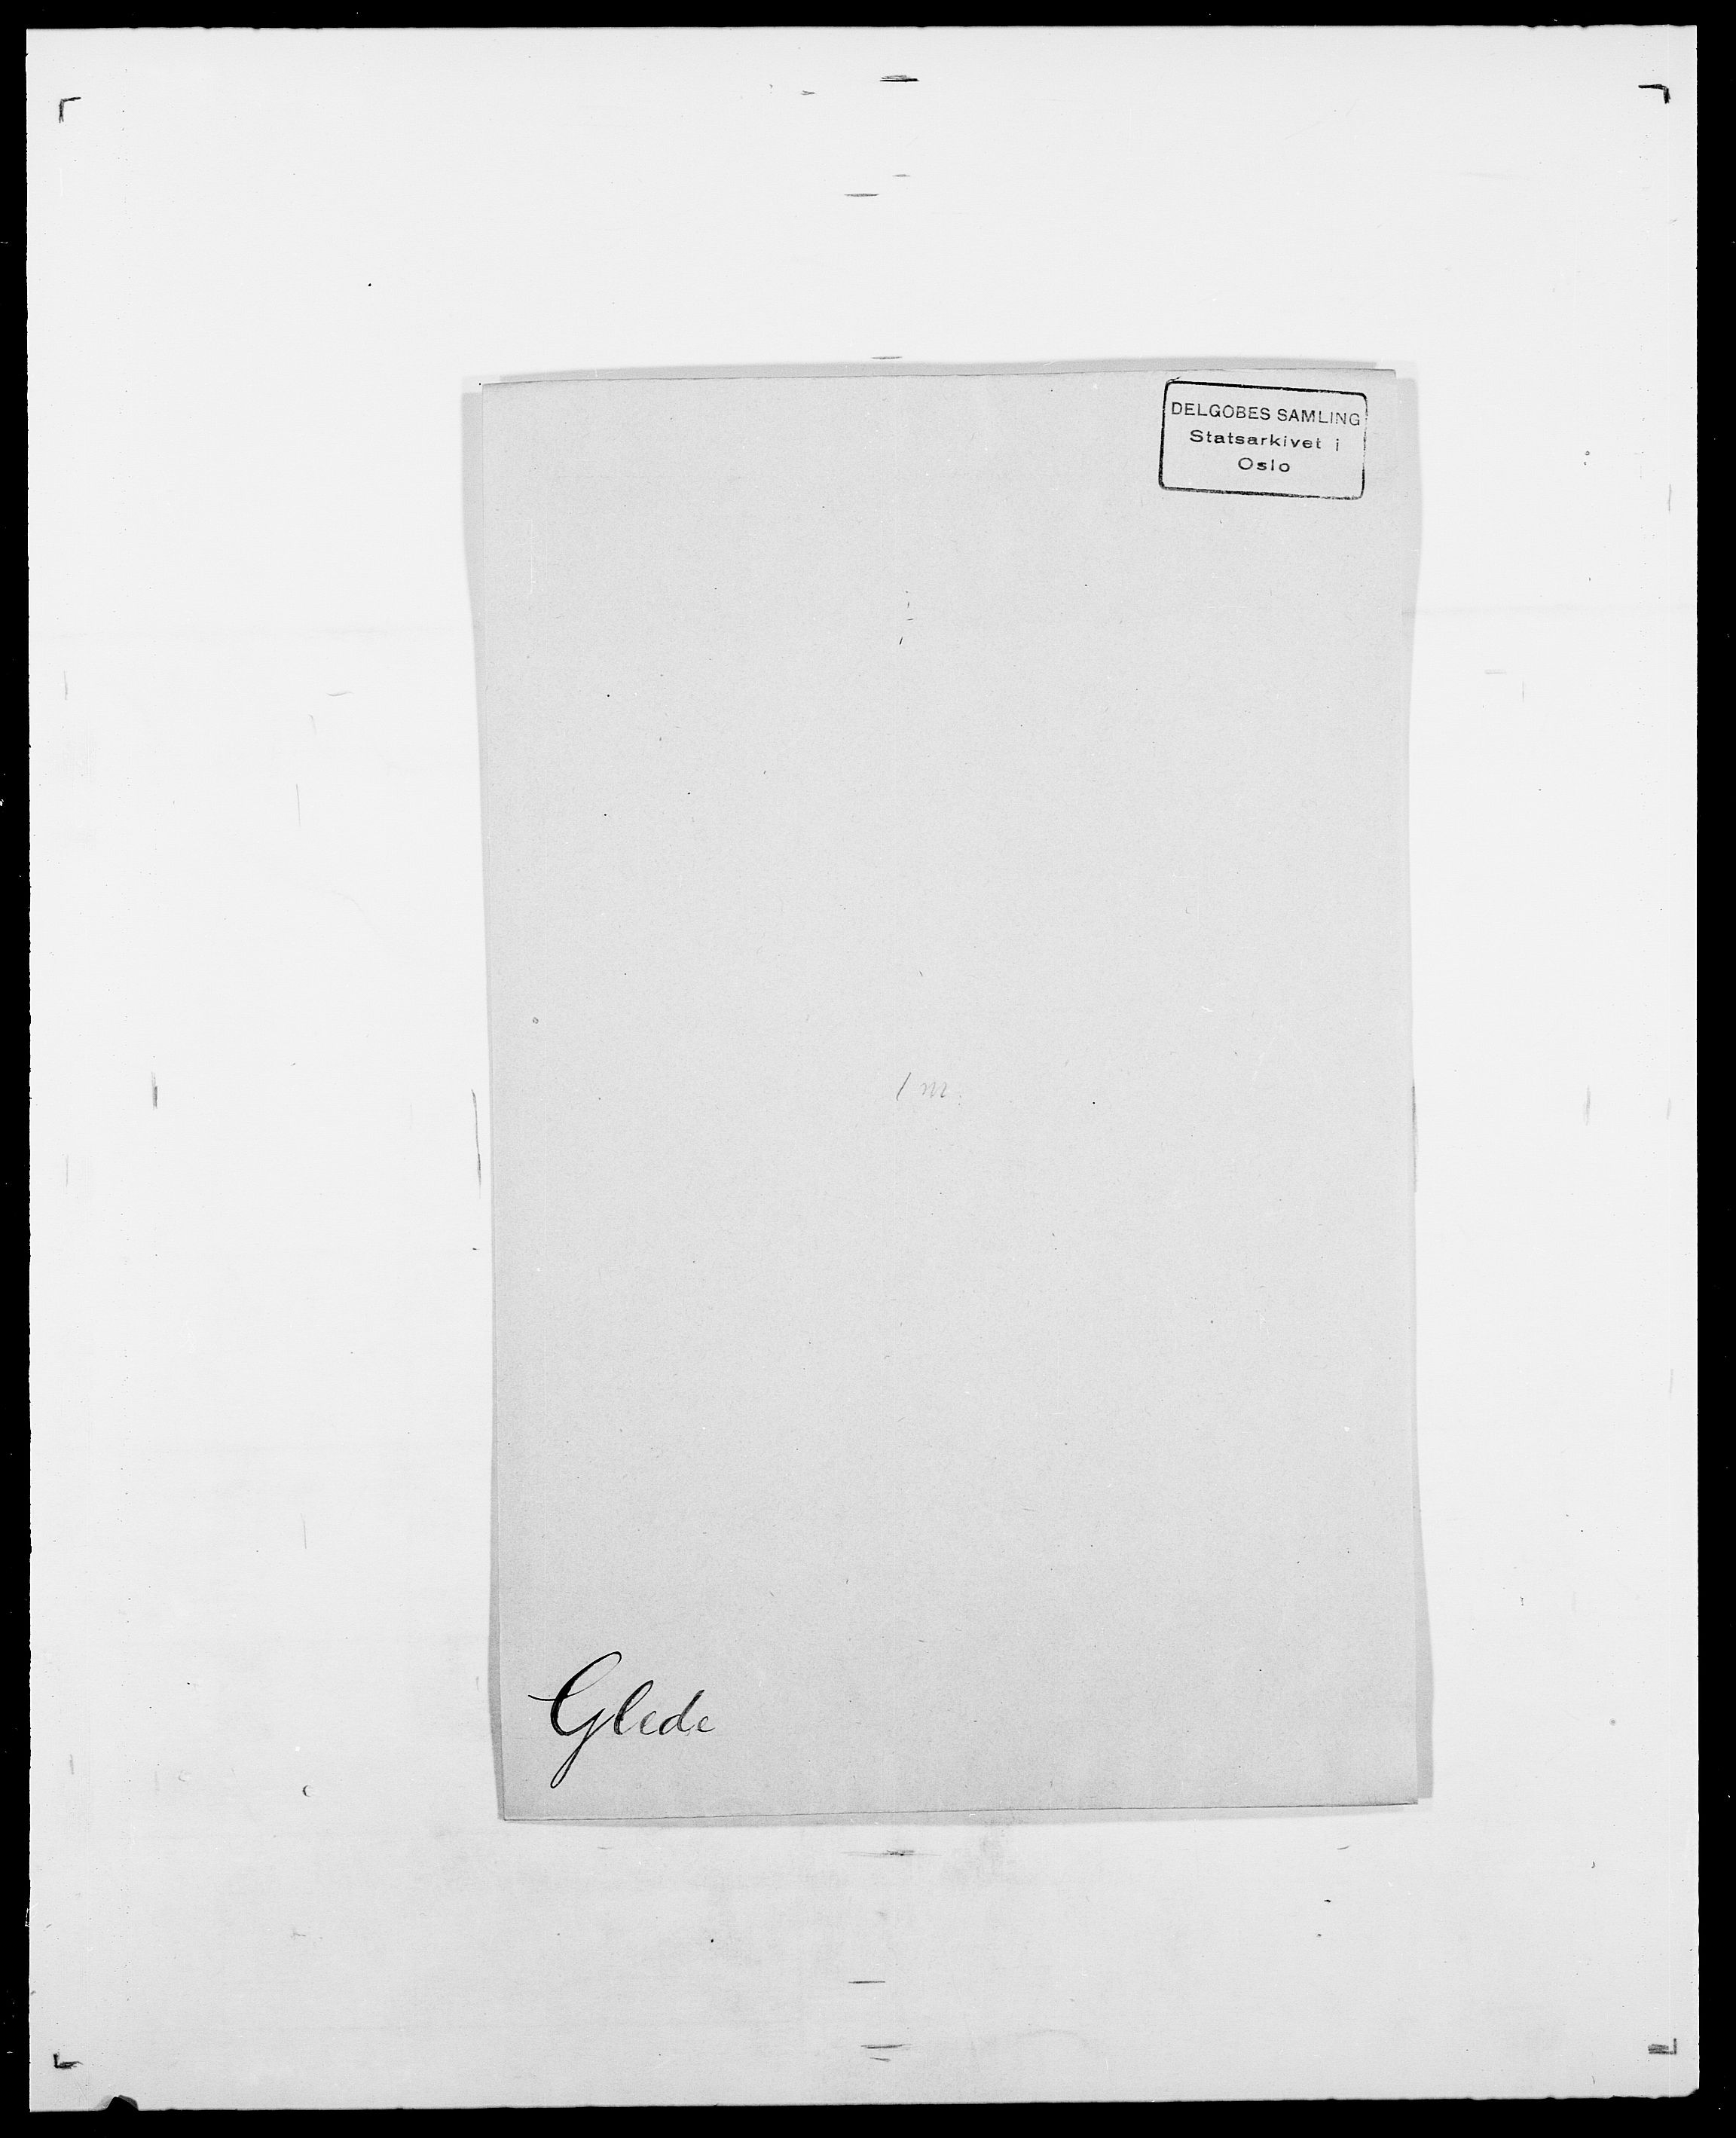 SAO, Delgobe, Charles Antoine - samling, D/Da/L0014: Giebdhausen - Grip, s. 305